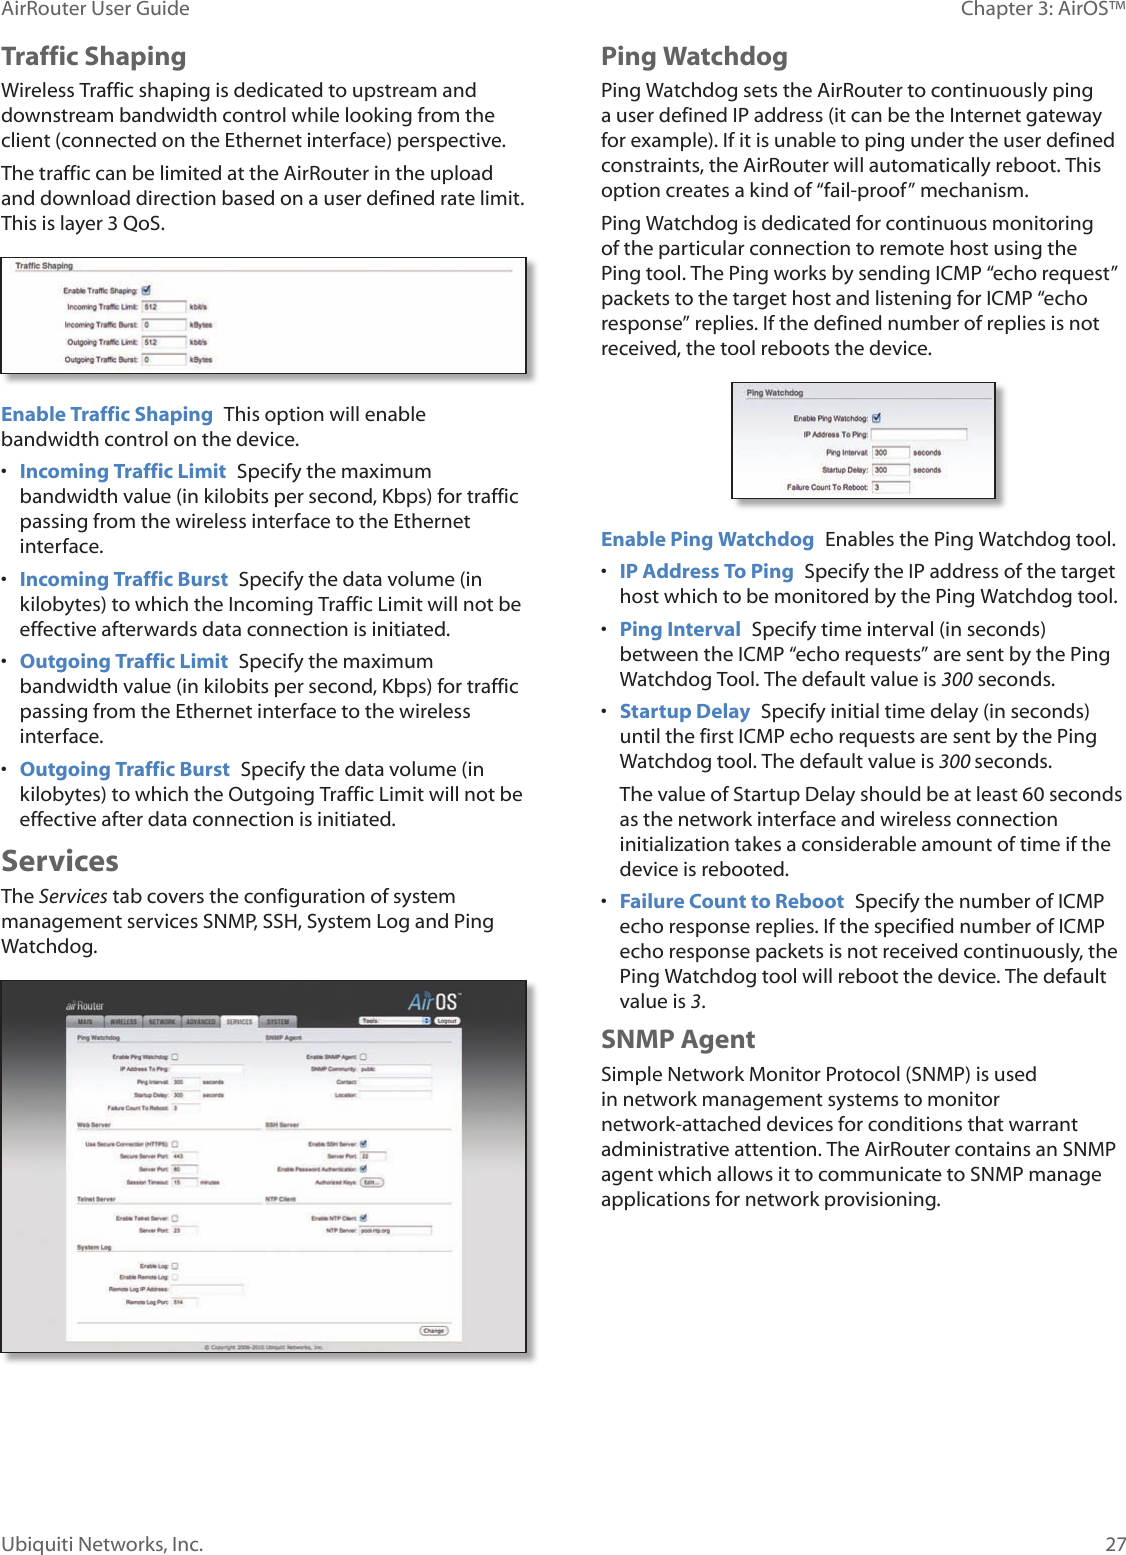 Ubiquiti Air Router manual